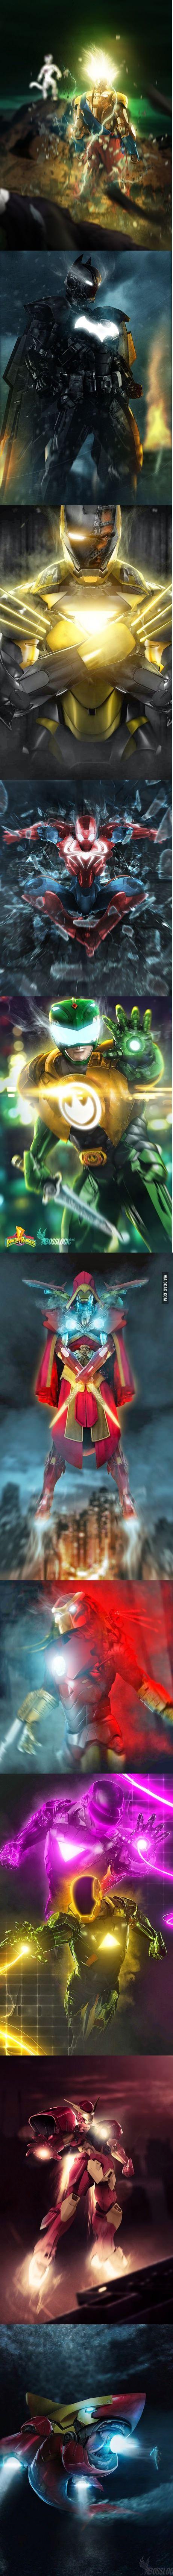 Iron Man Mashups. Freakin awesome!